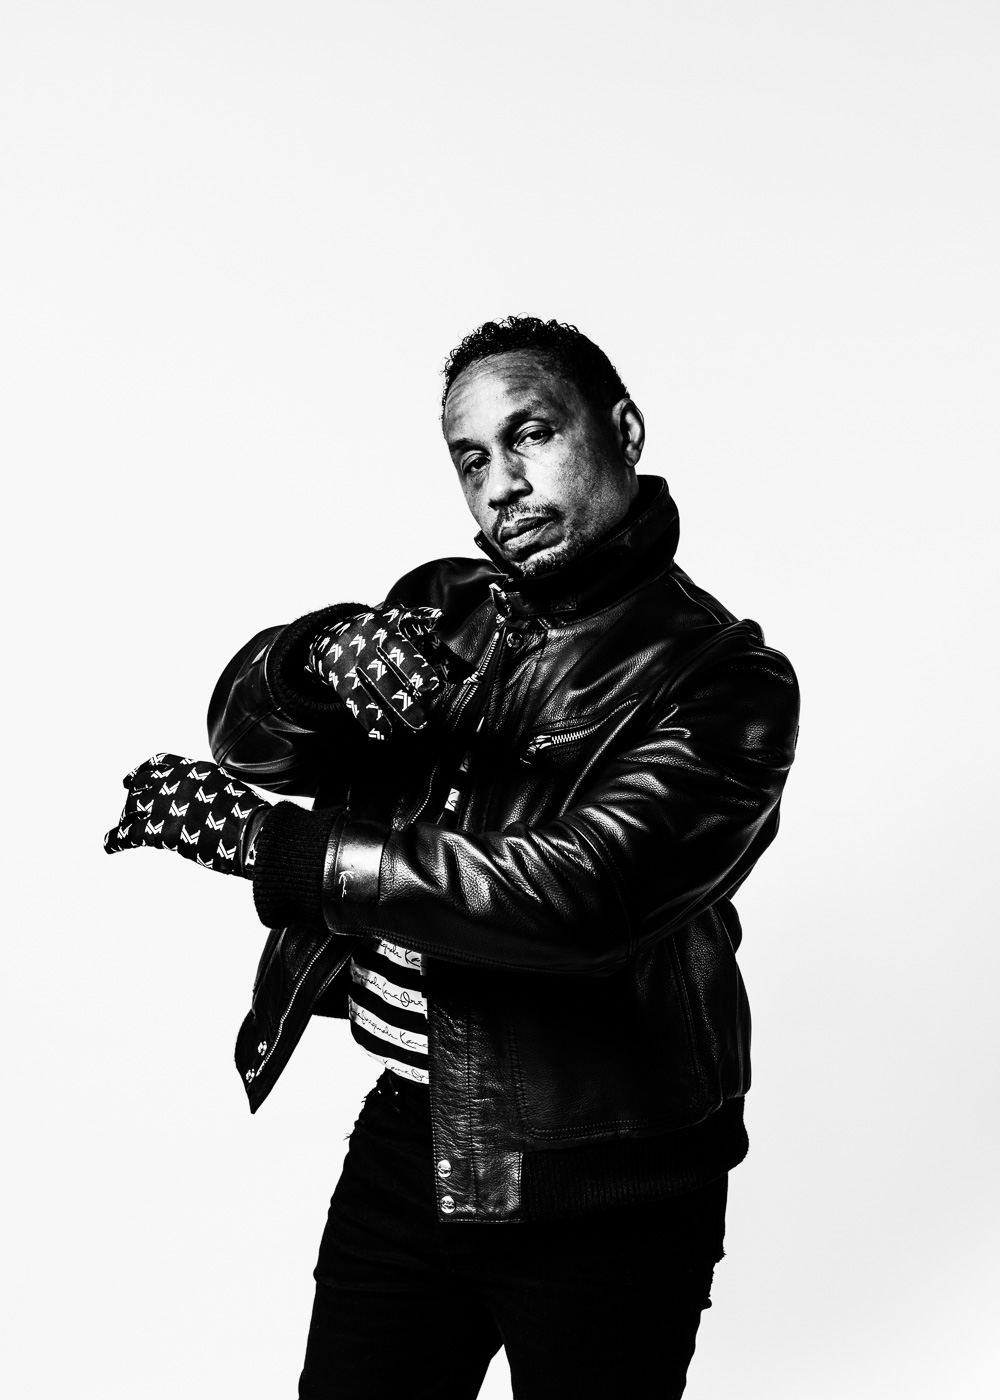 Karl Kani, American fashion designer, founder and CEO of the hip hop fashion brand Karl Kani.